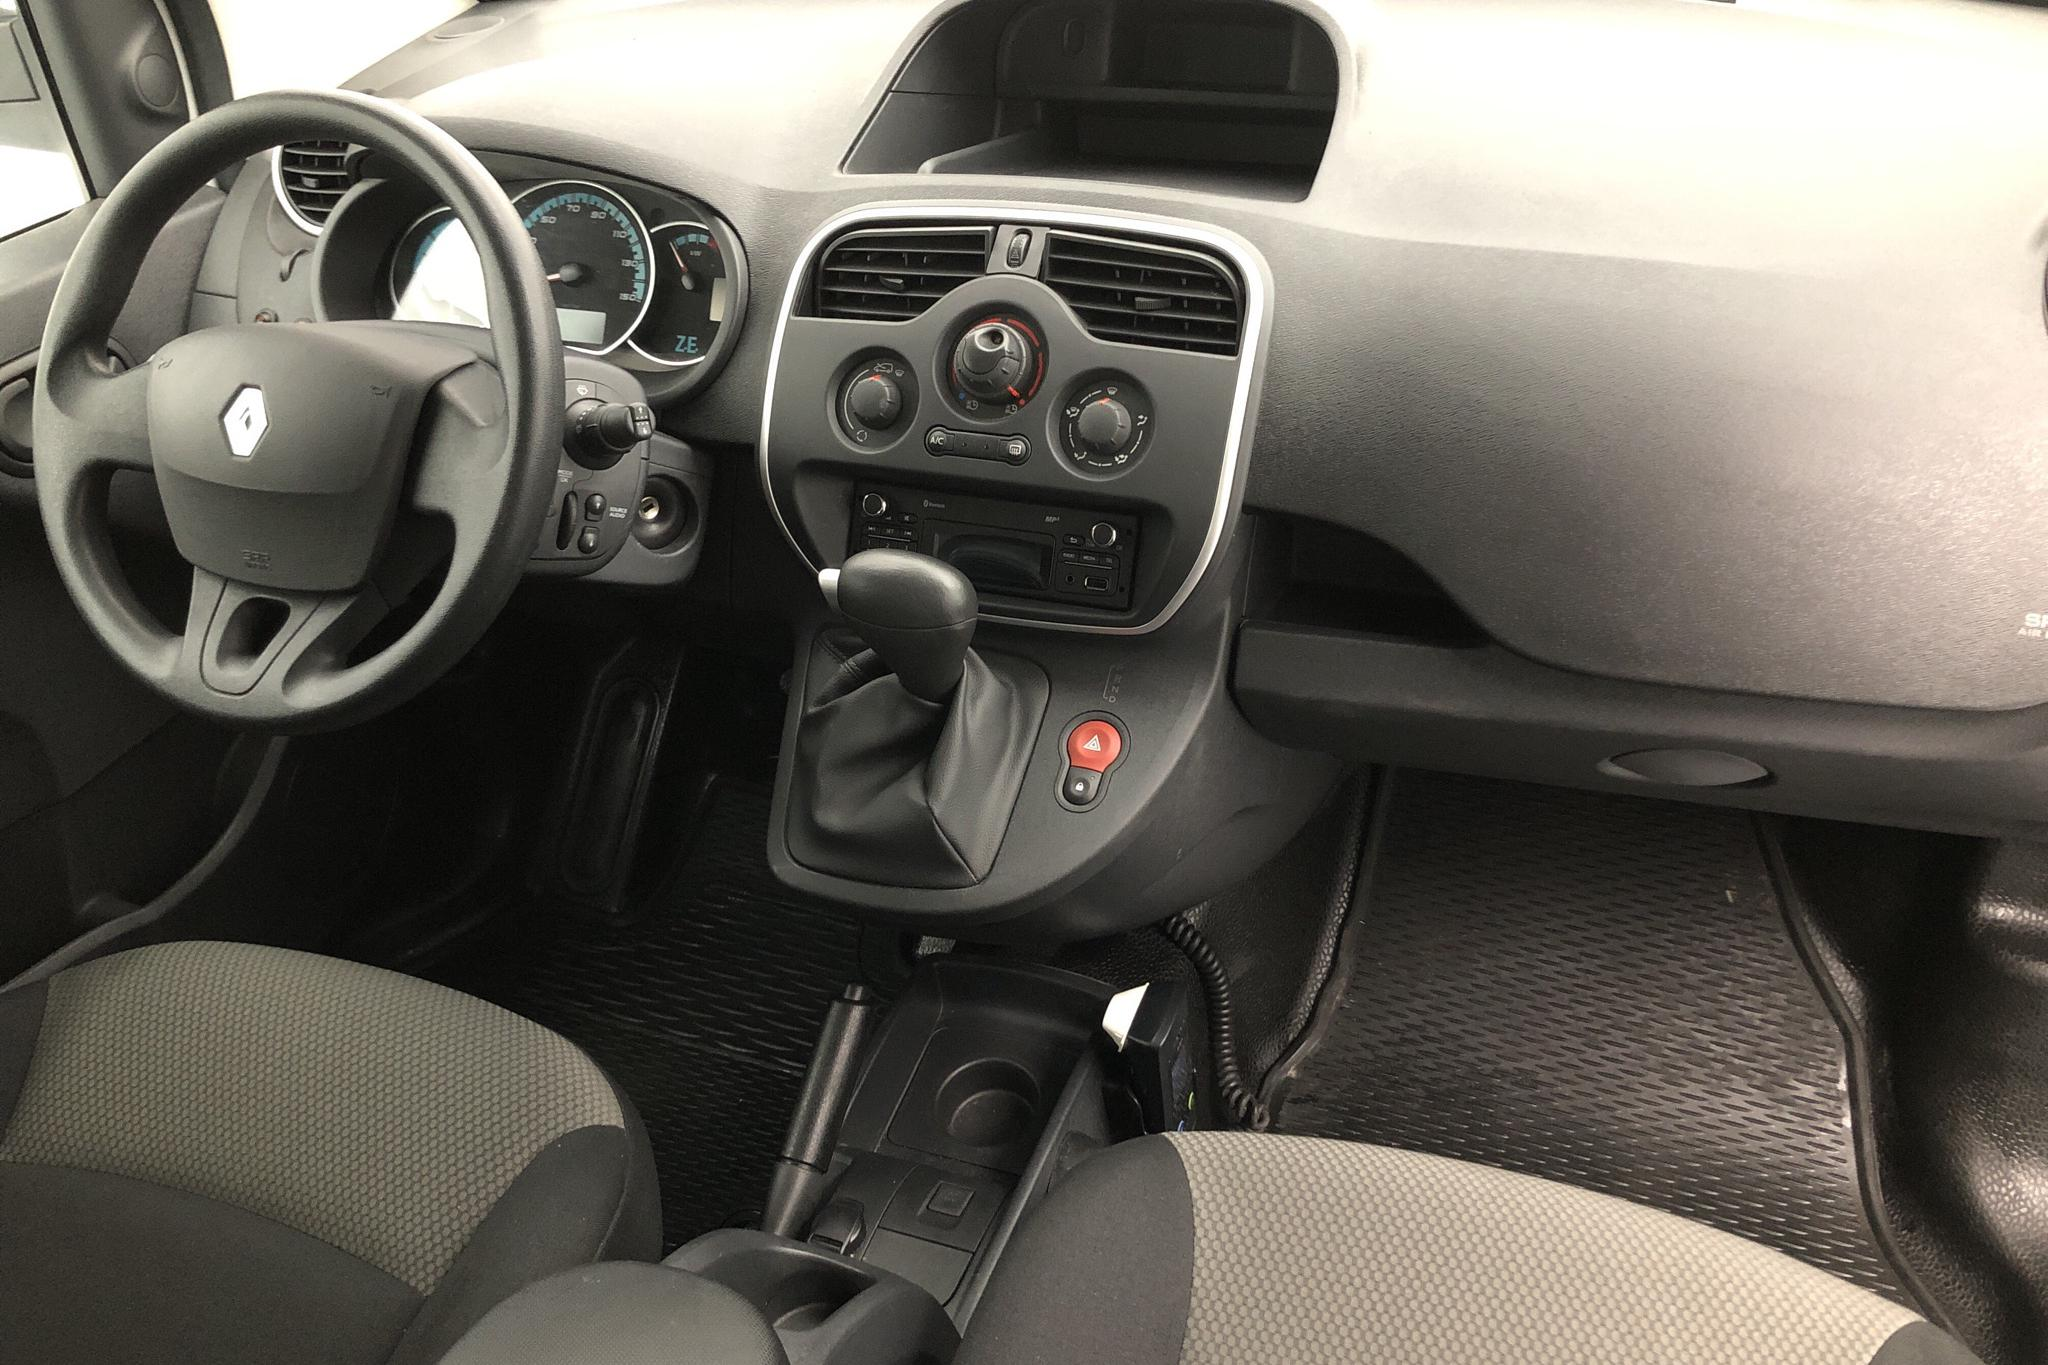 Renault Kangoo Z.E Power Plus 33 kWh Maxi Skåp (60hk) - 1 387 mil - Automat - vit - 2018